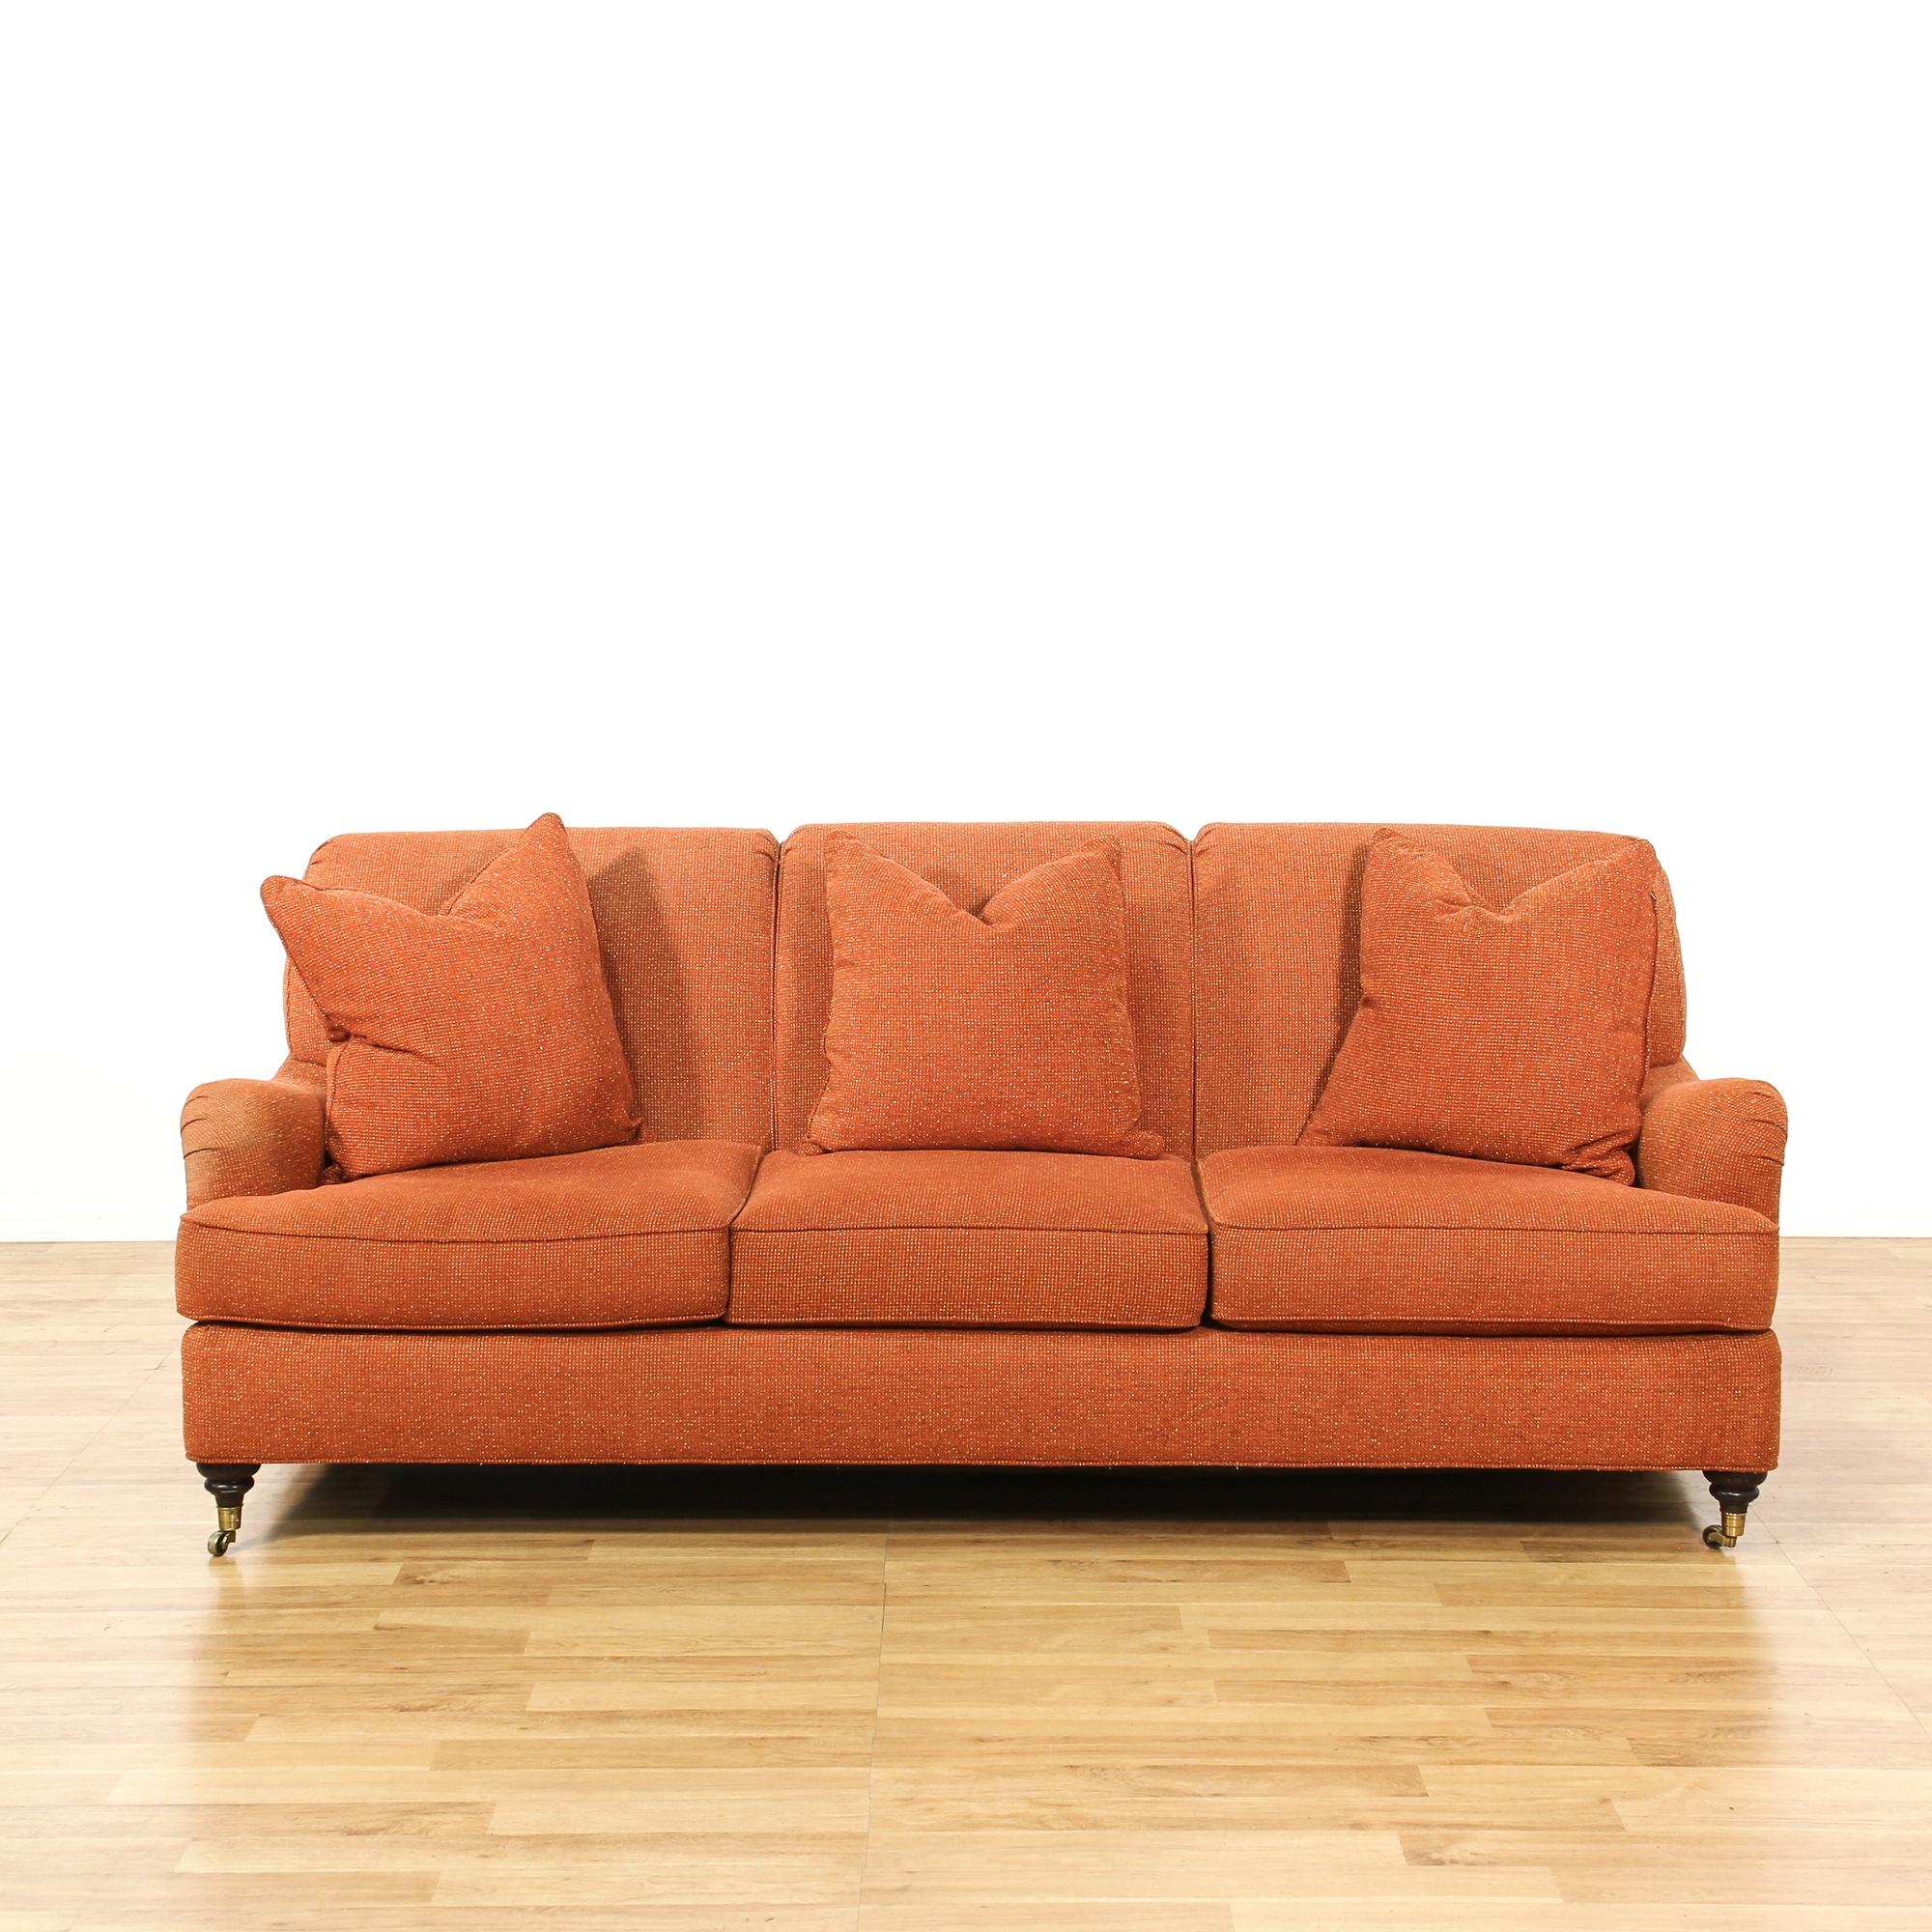 Henredon Orange Coral Sofa On Casters Loveseat Vintage Furniture San Diego Los Angeles